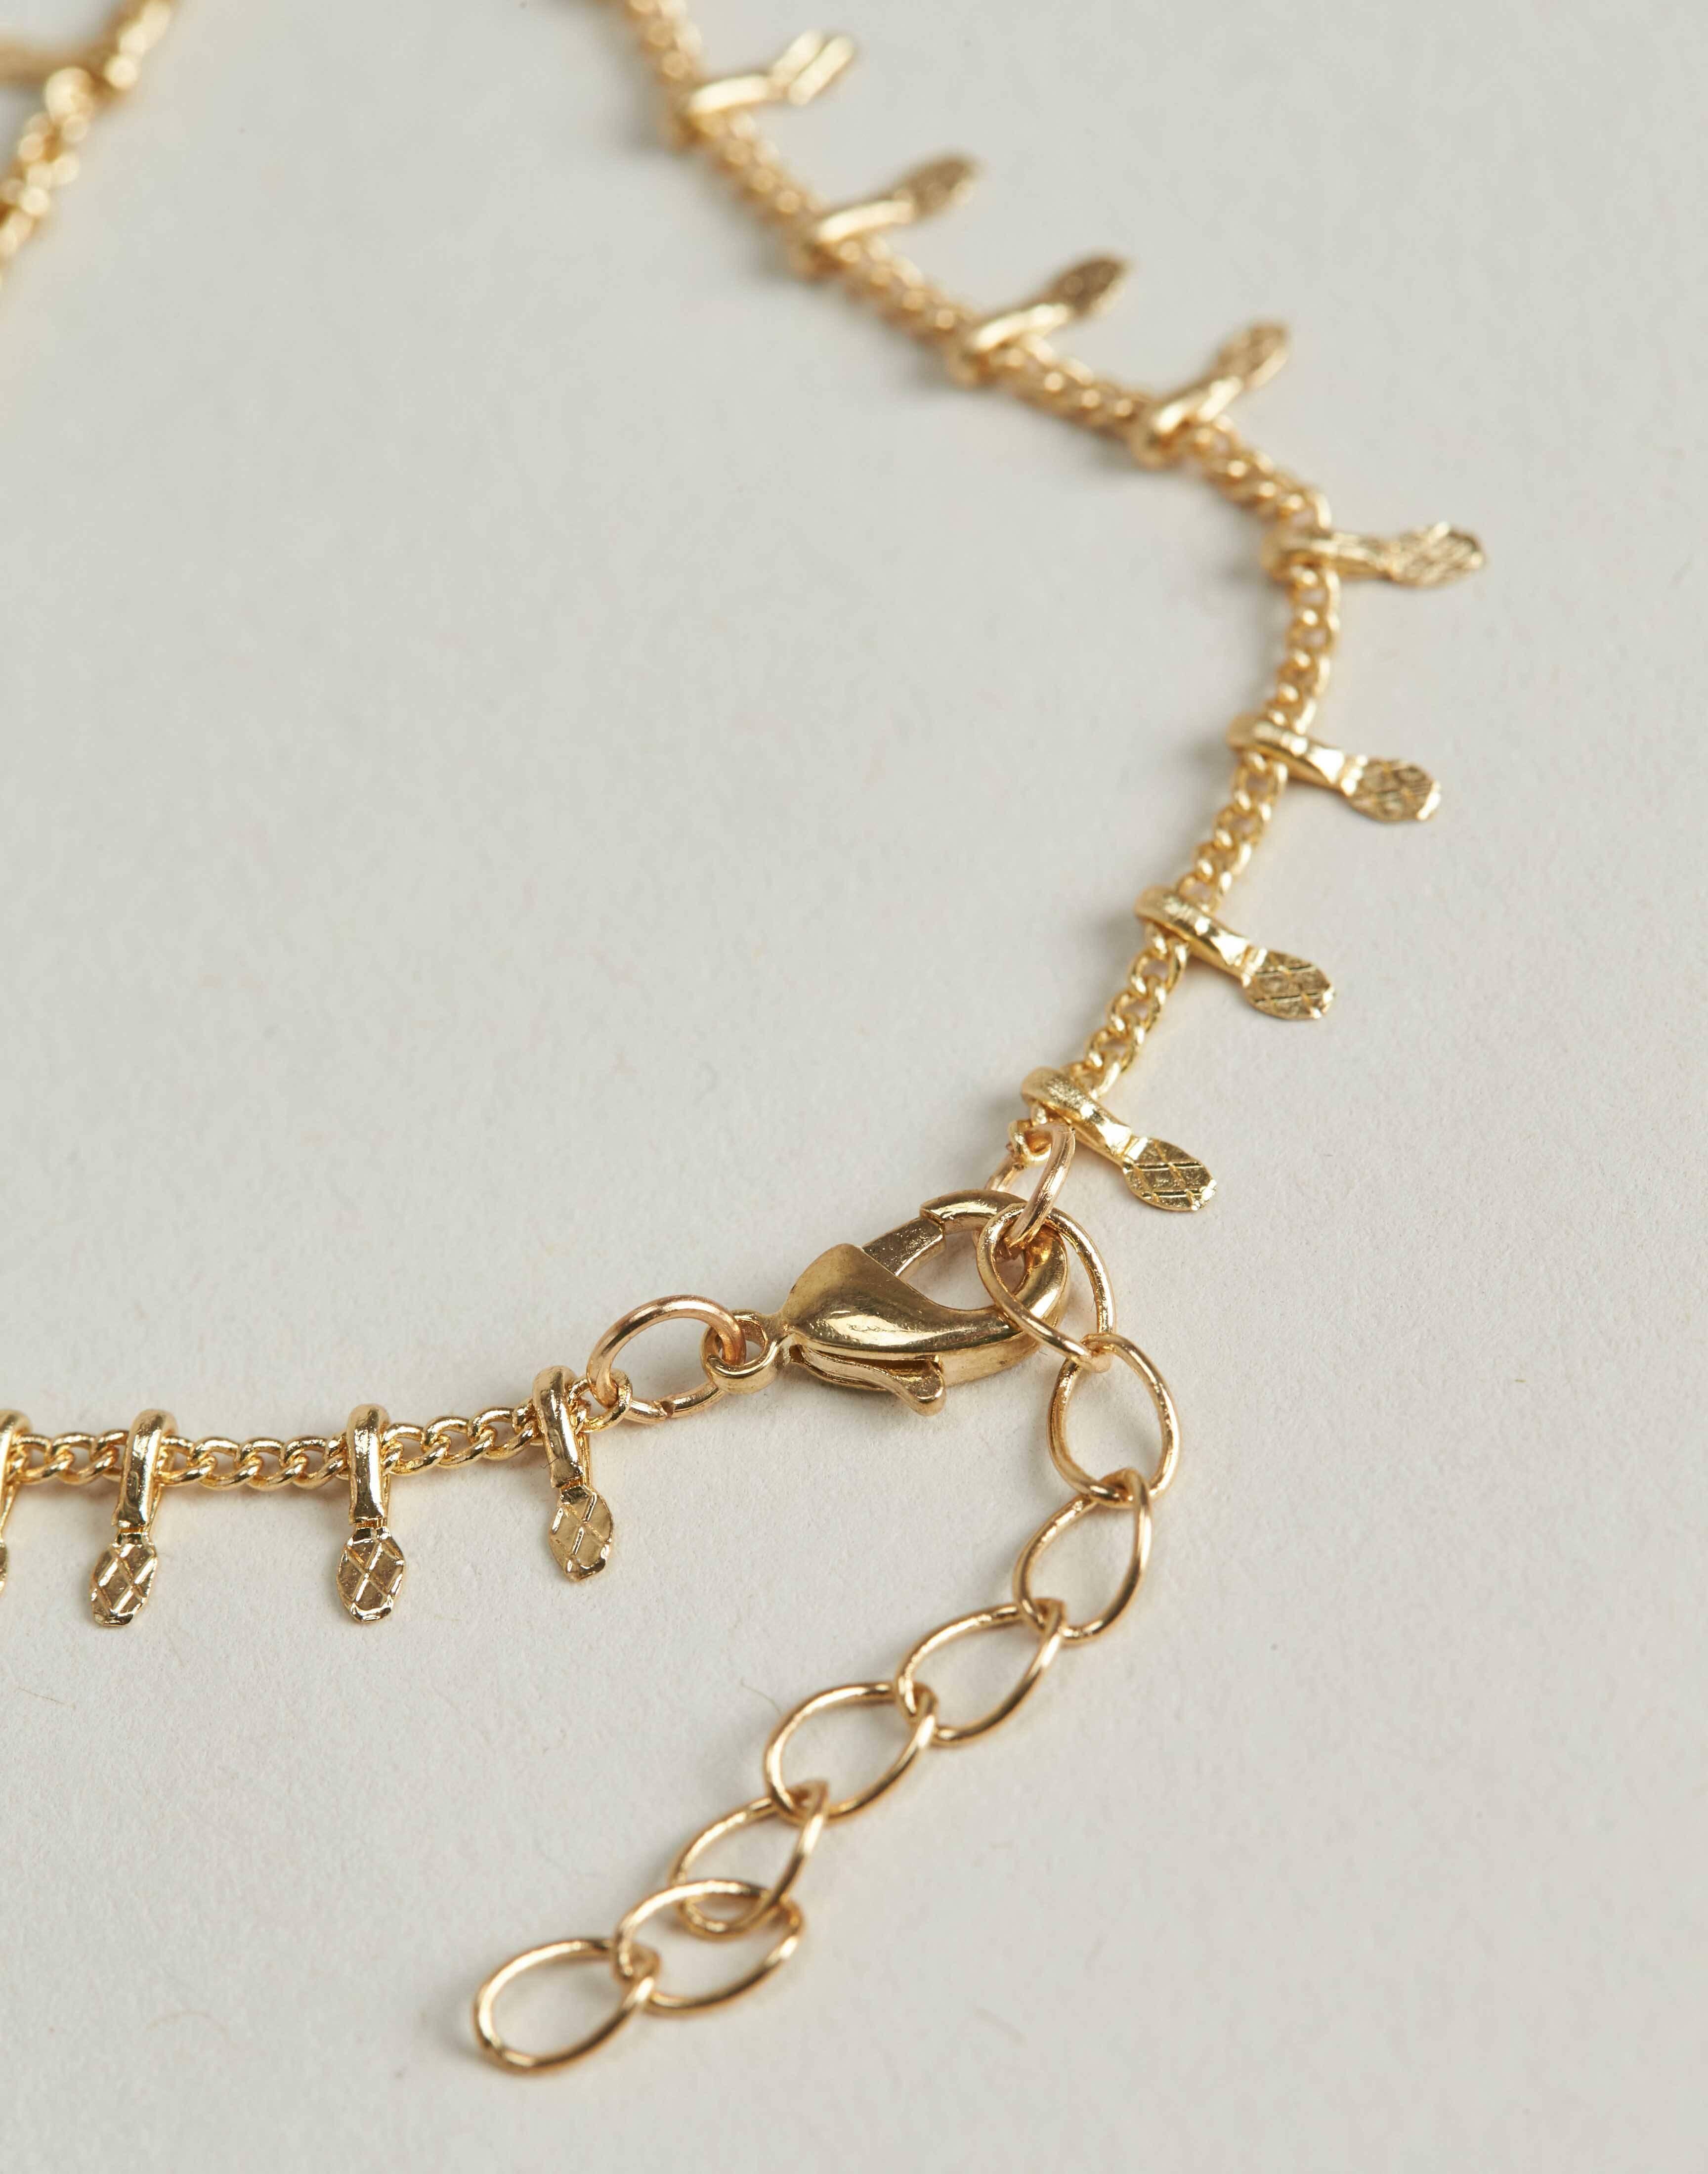 Hanging teardrops bracelet